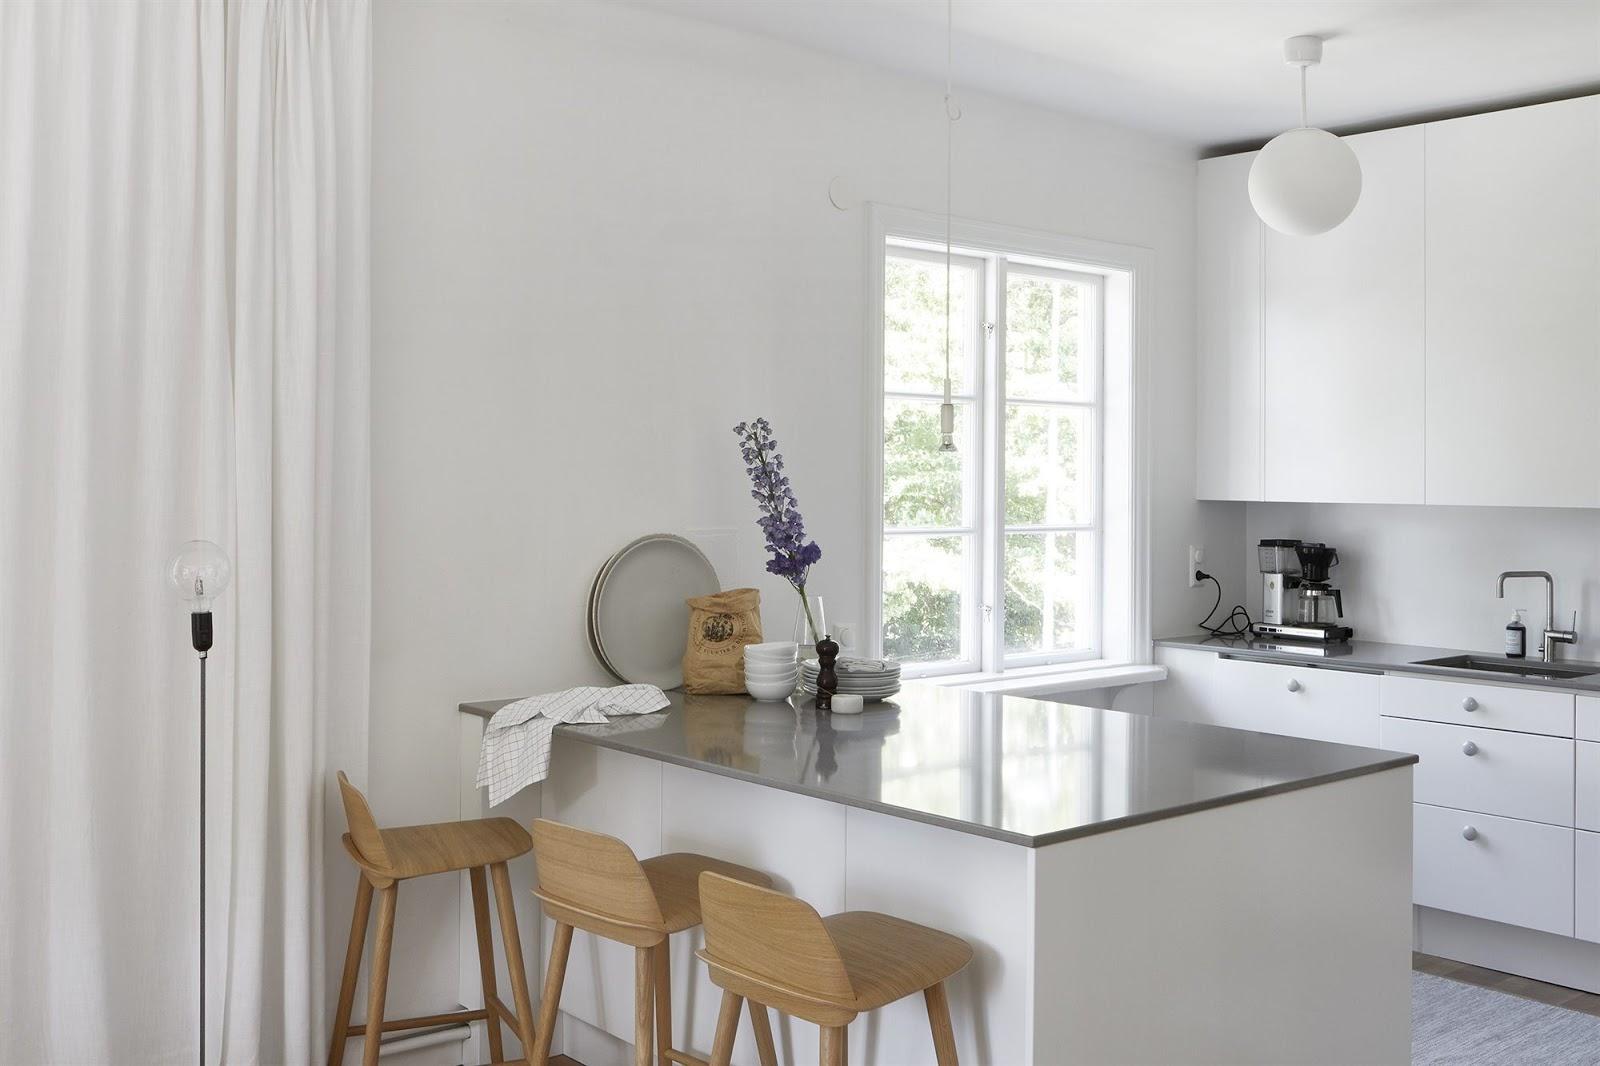 Deco ideas para decorar un piso abuhardillado el blog for Ideas para decorar un piso